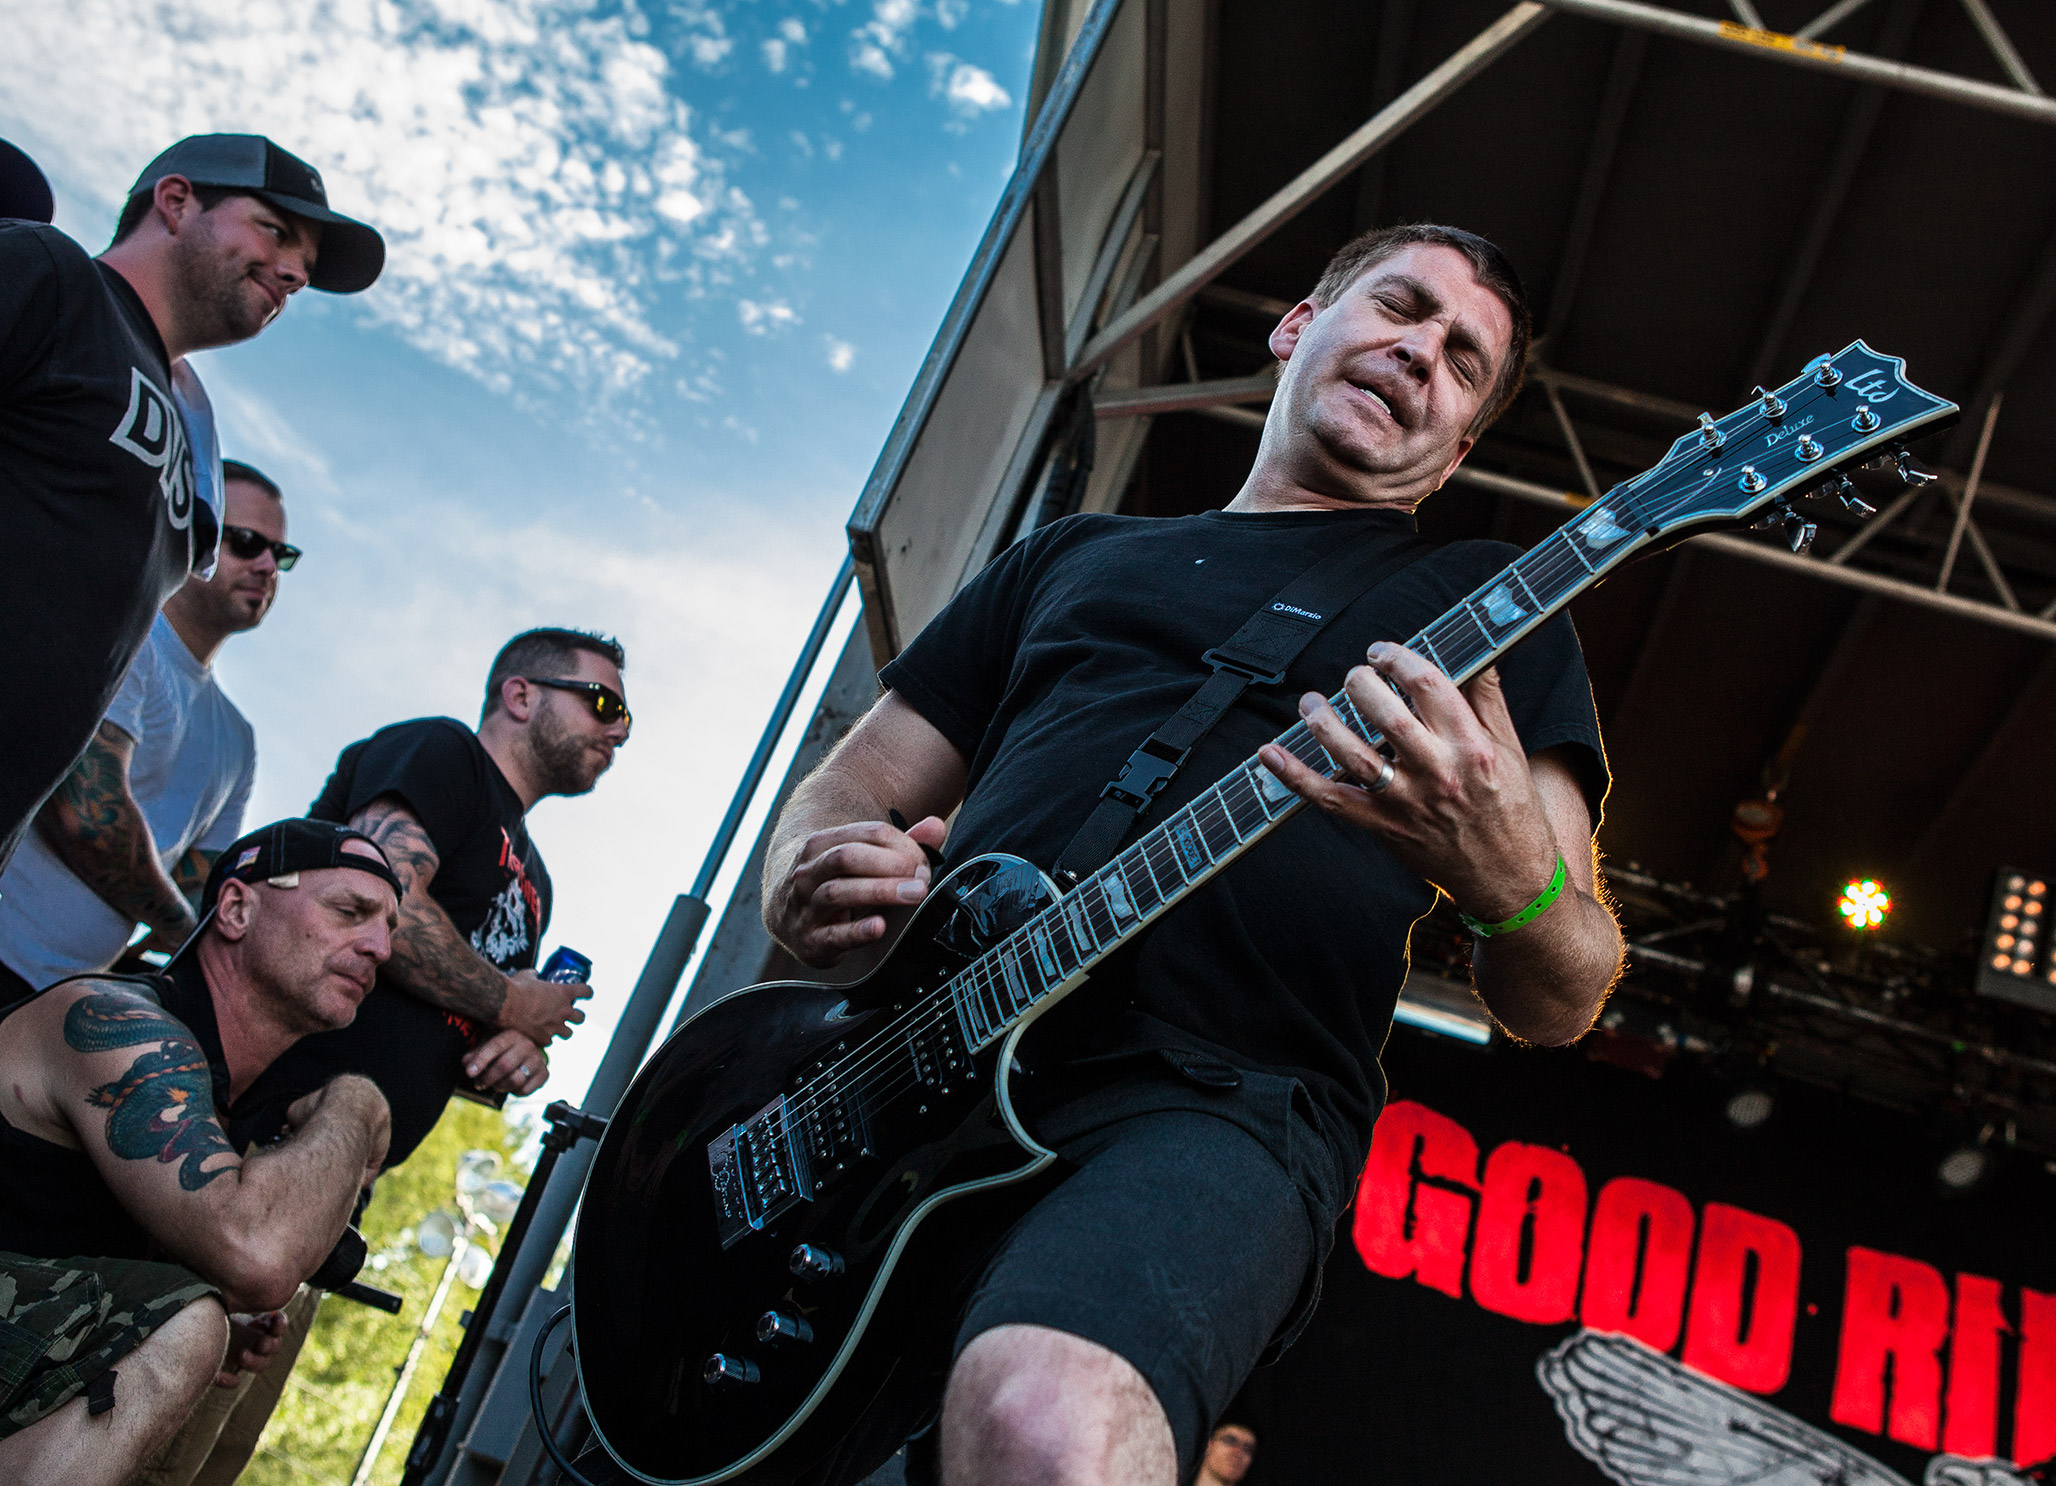 amnesia-rockfest-2015-good-riddance-photo-9